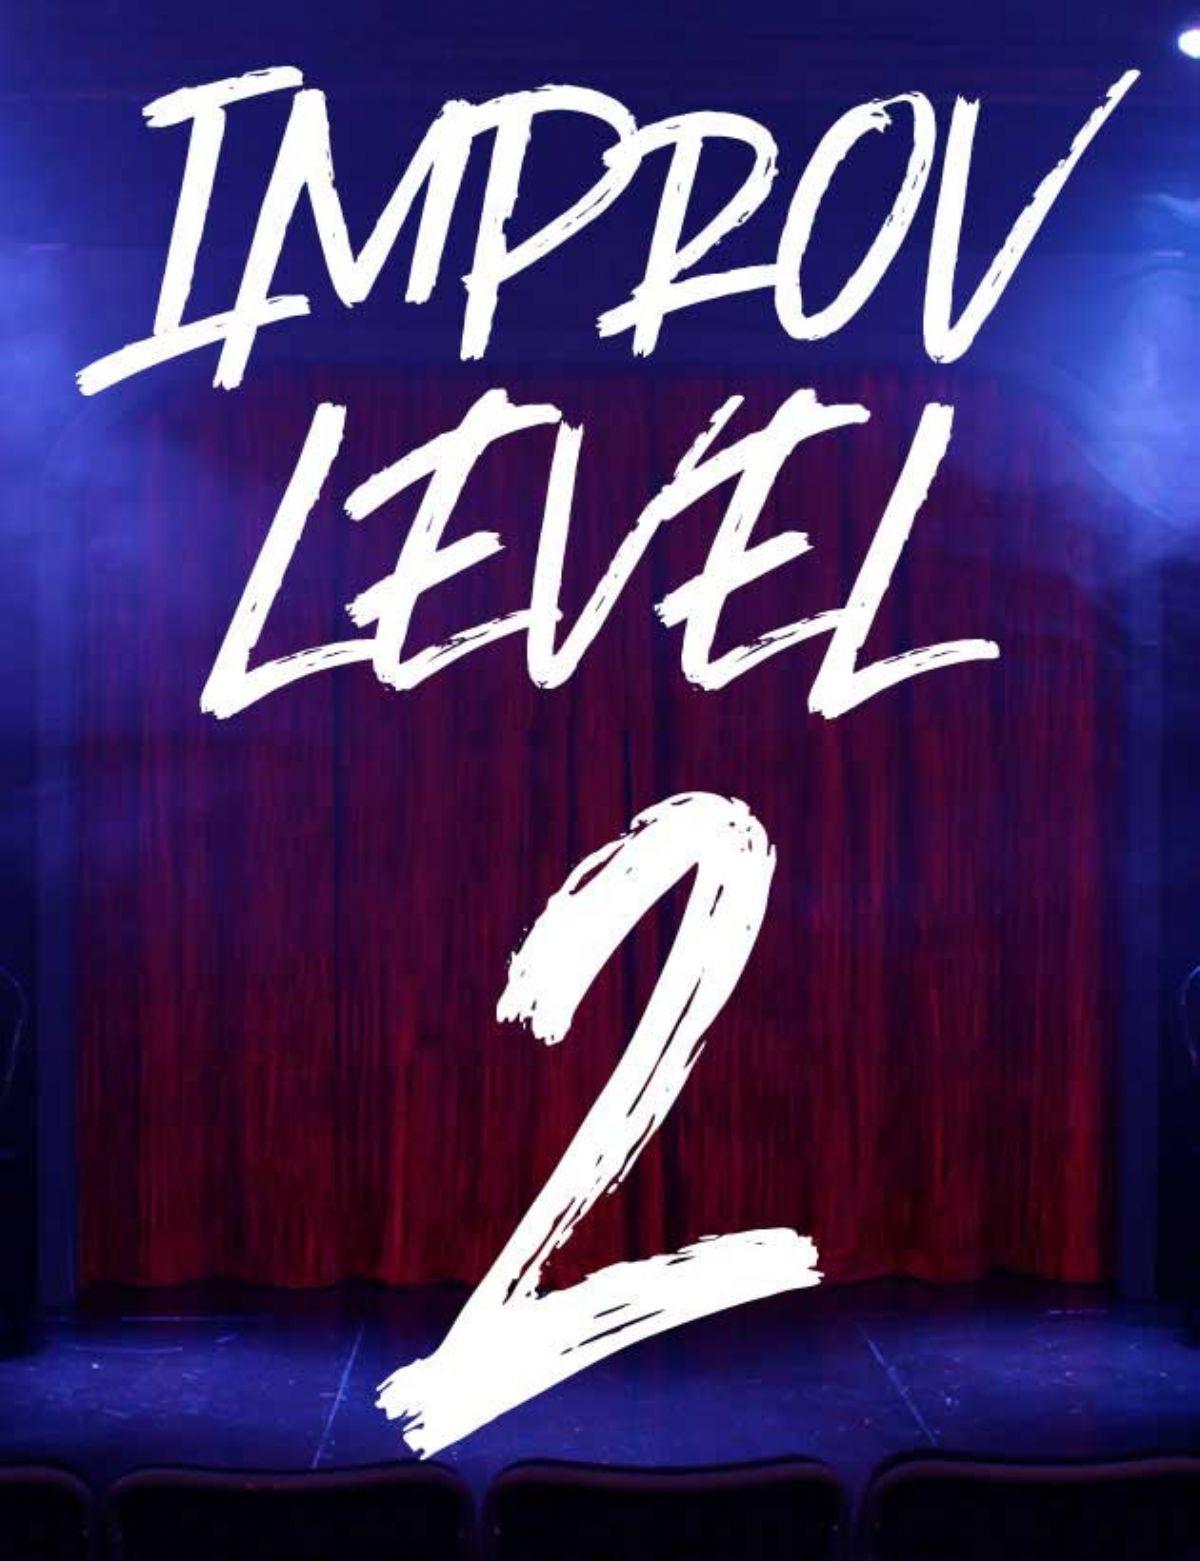 CLASS: Improv Level 2 w/ Molly, Mondays (2020-3)